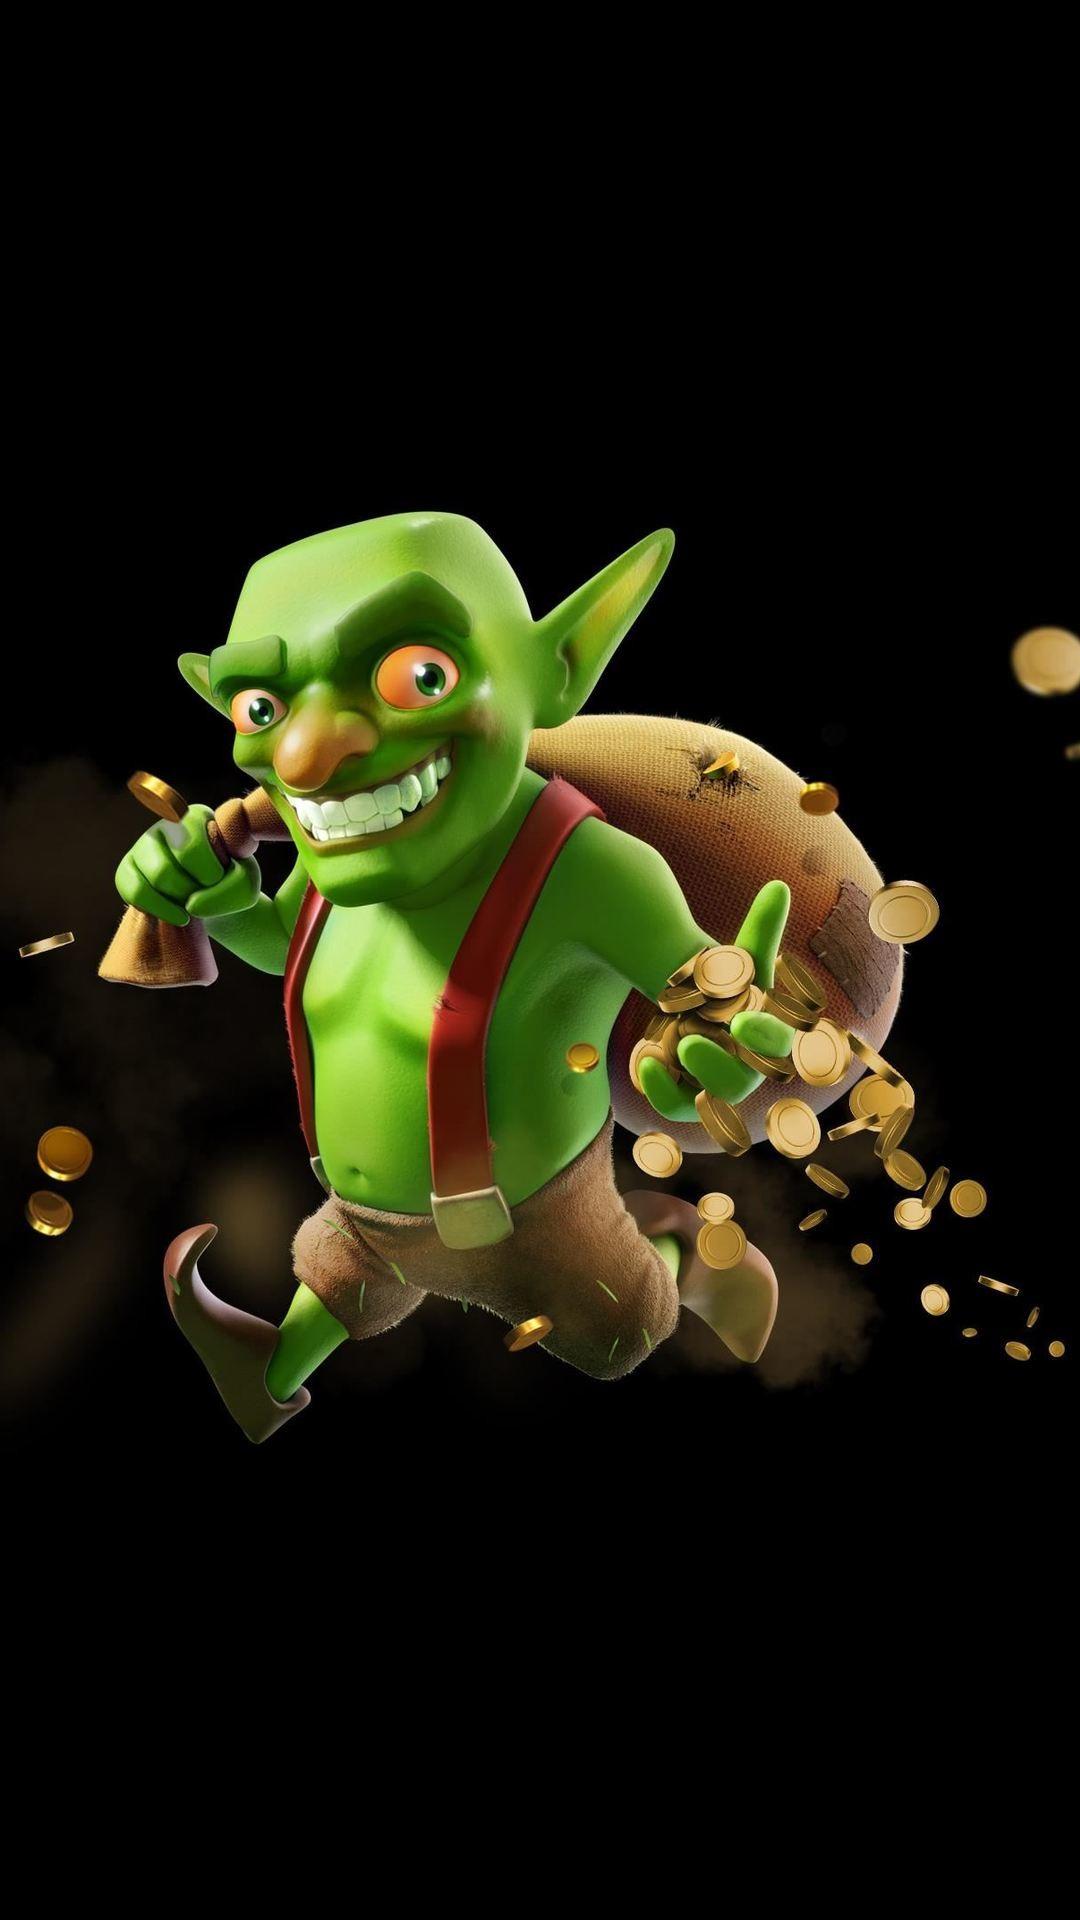 goblin-clash-of-clans-on.jpg